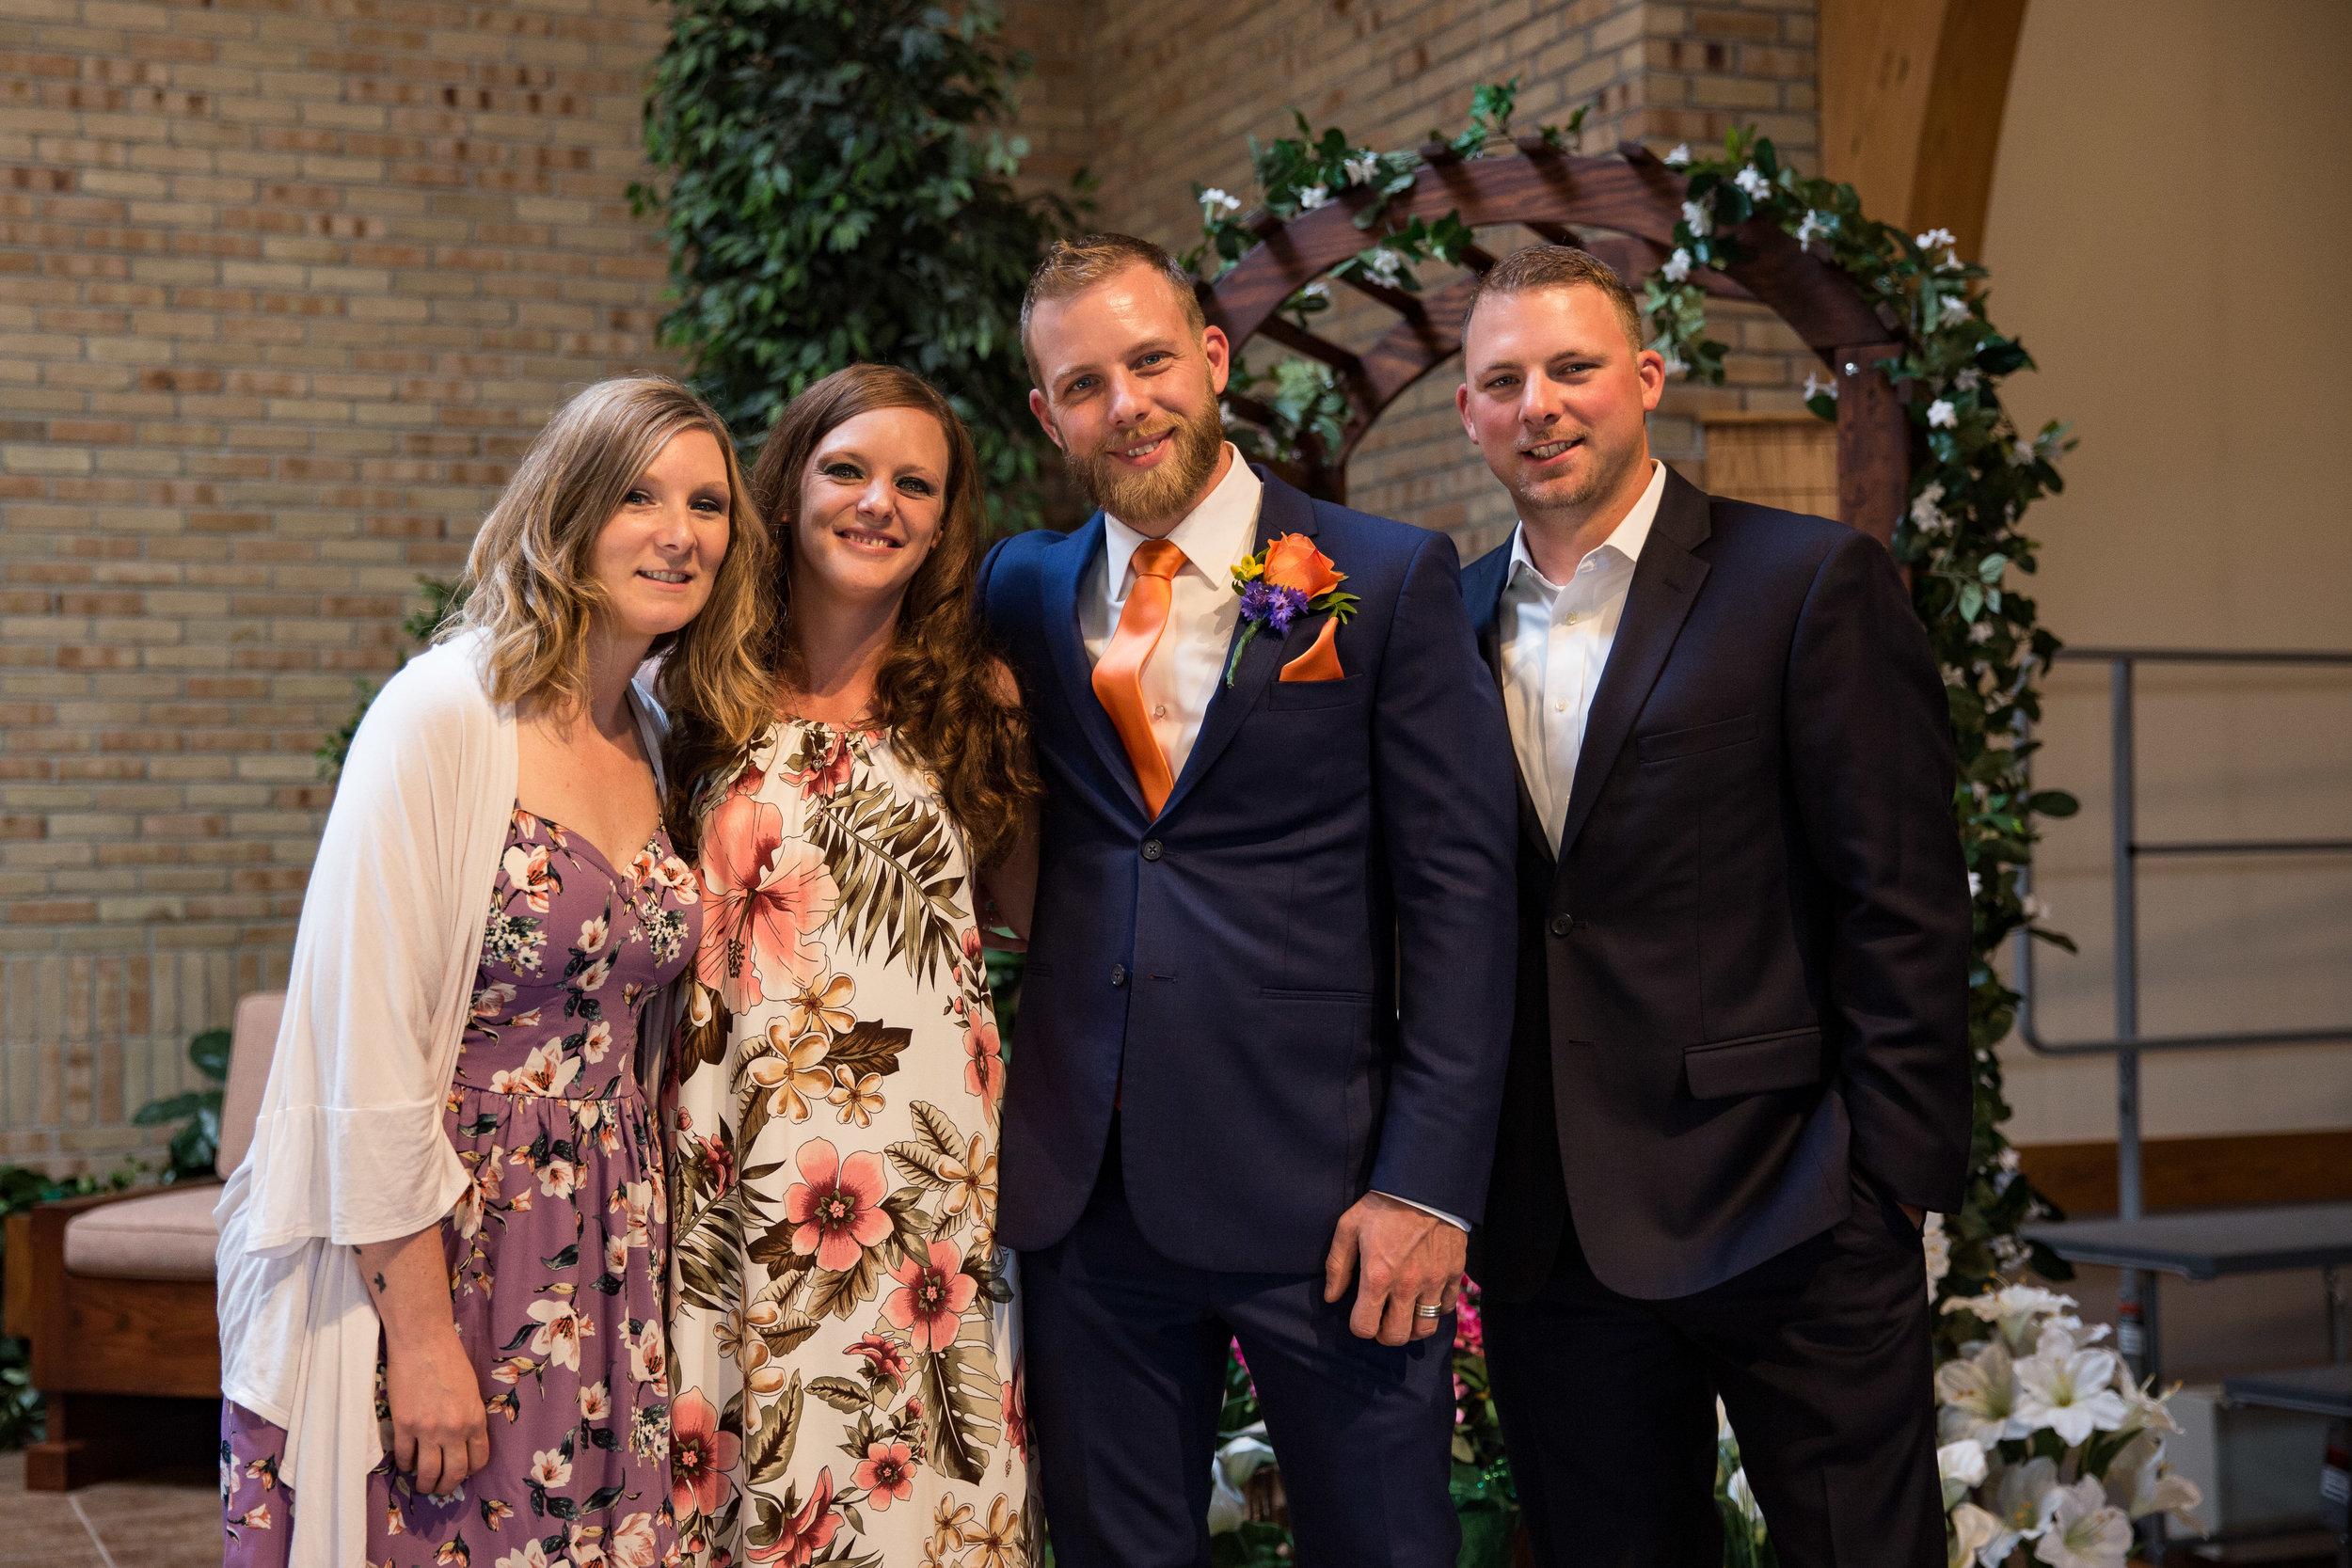 Natalie and Dallas Mooney Wedding 6-8-19_Tania Watt Photography-187.jpg